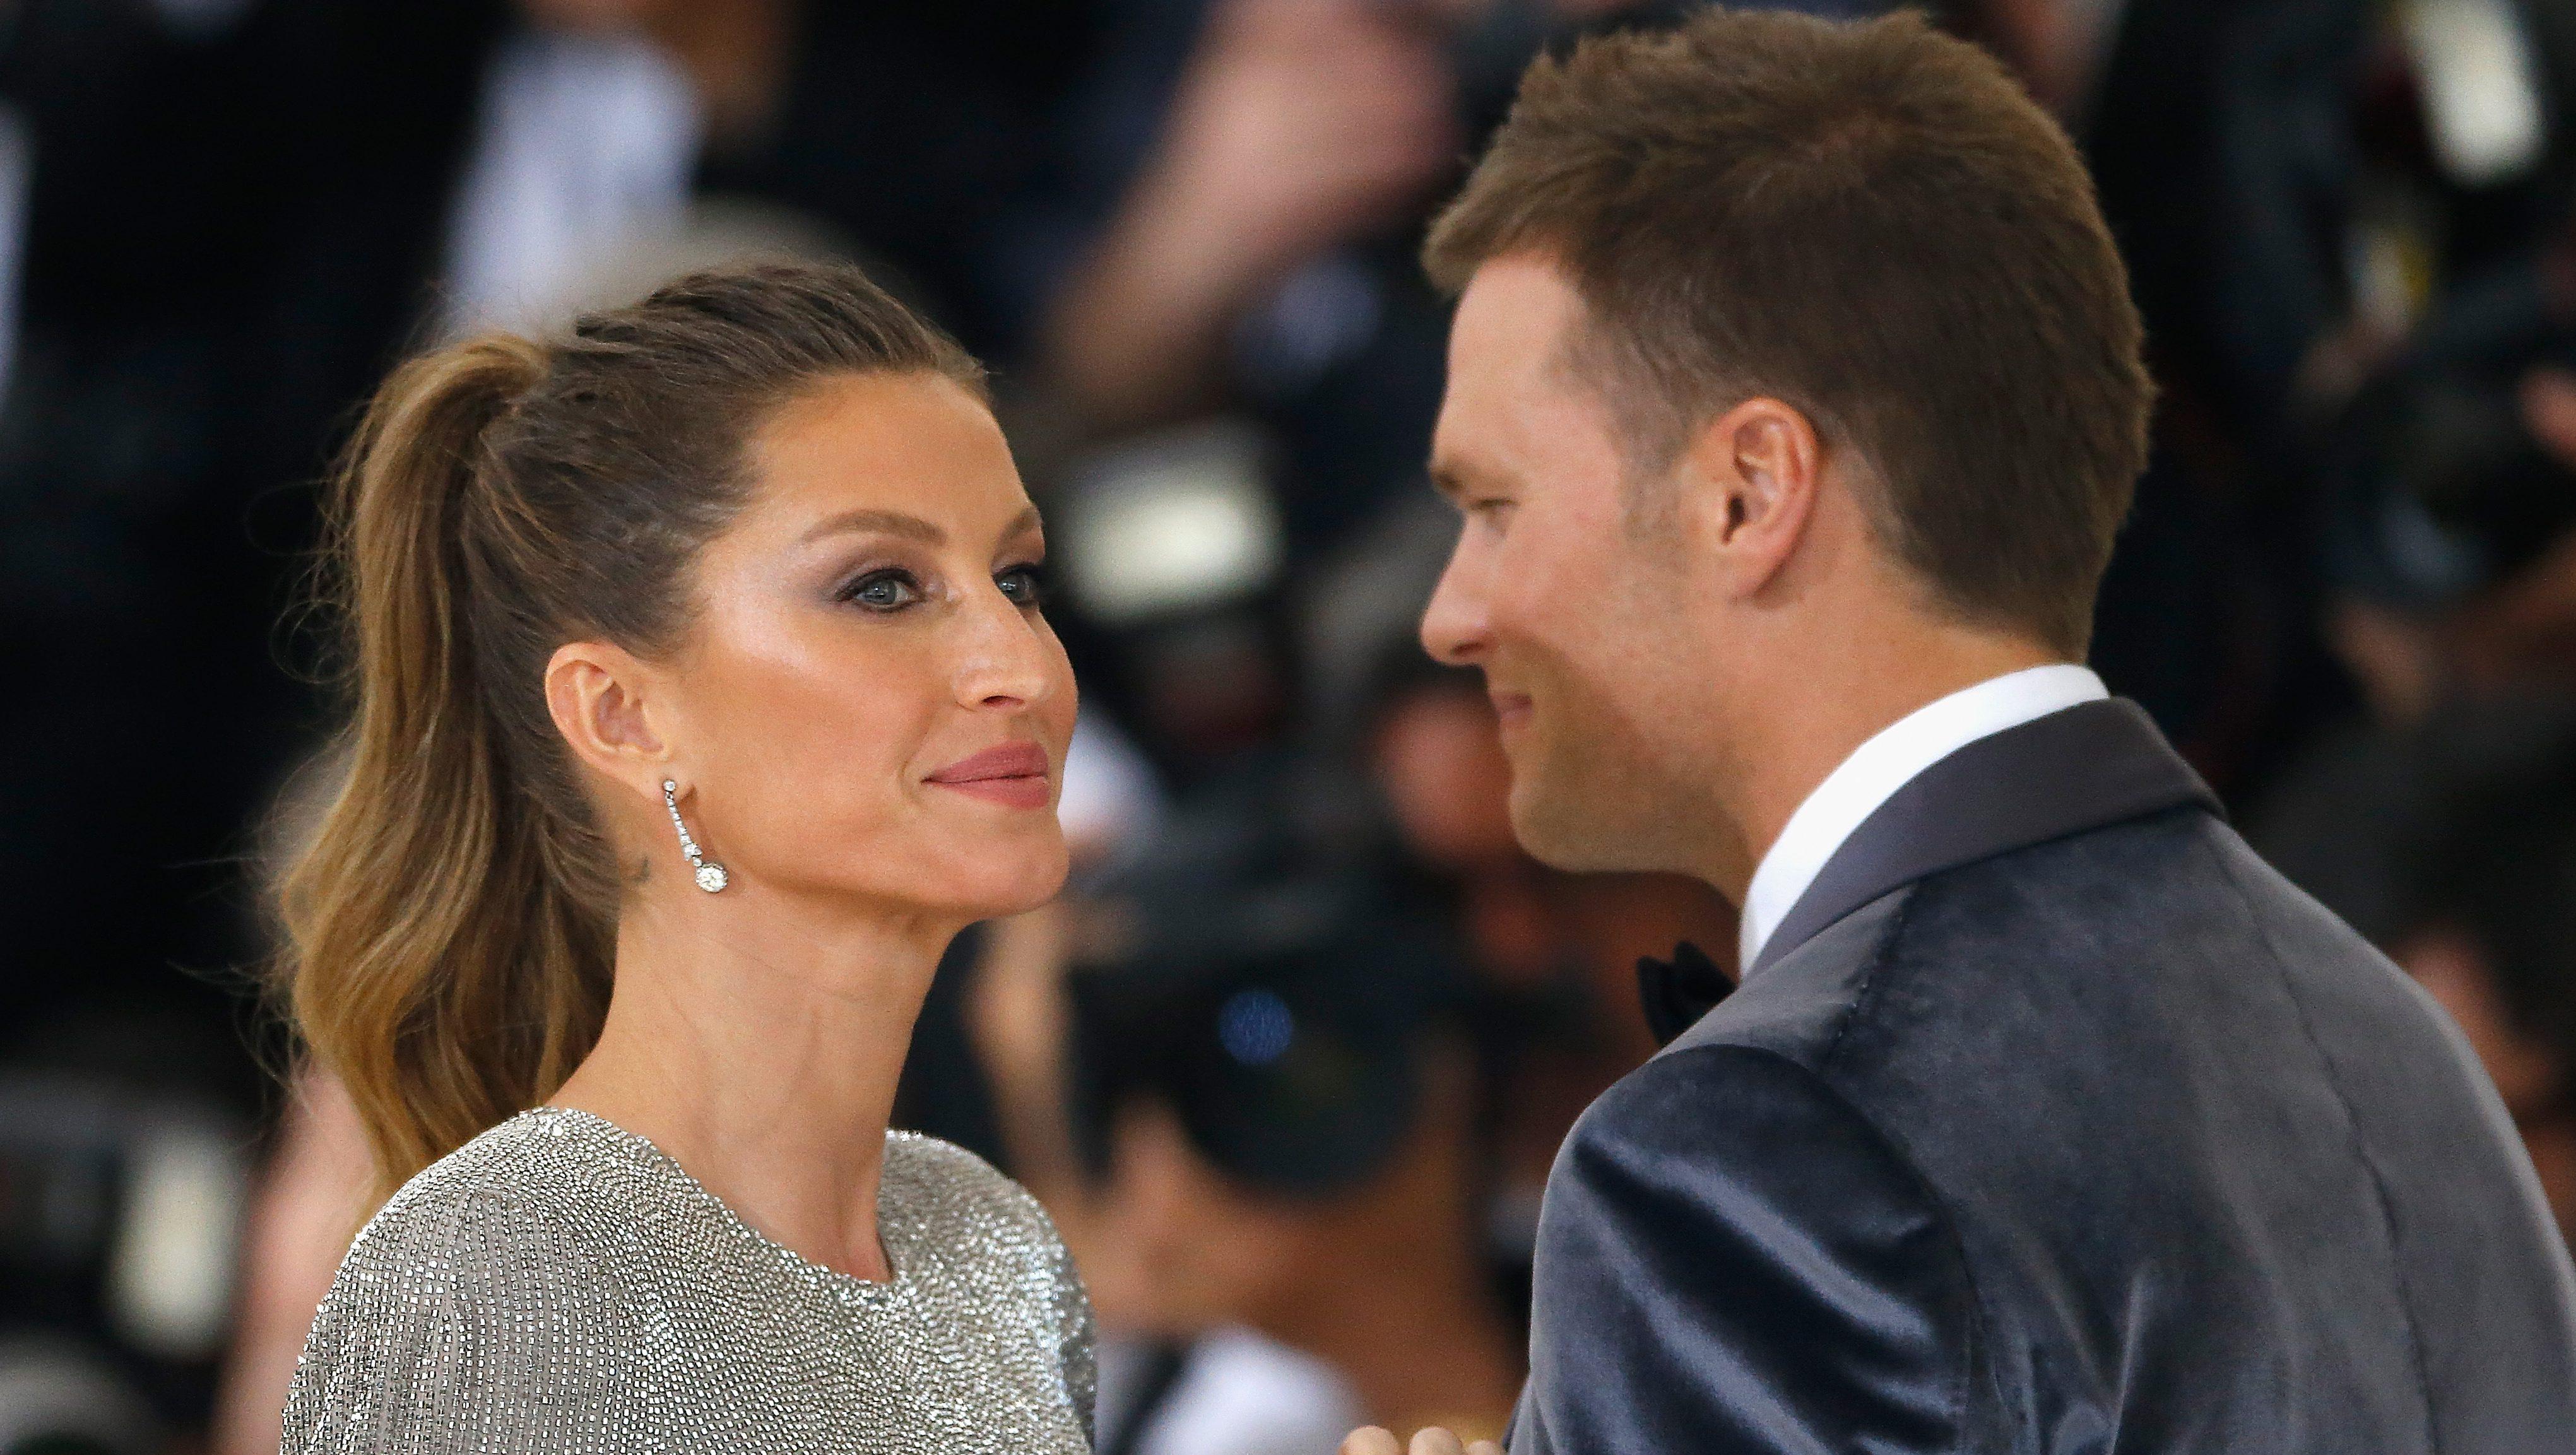 Gisele Tom Brady S Wife 5 Fast Facts You Need To Know Heavy Com